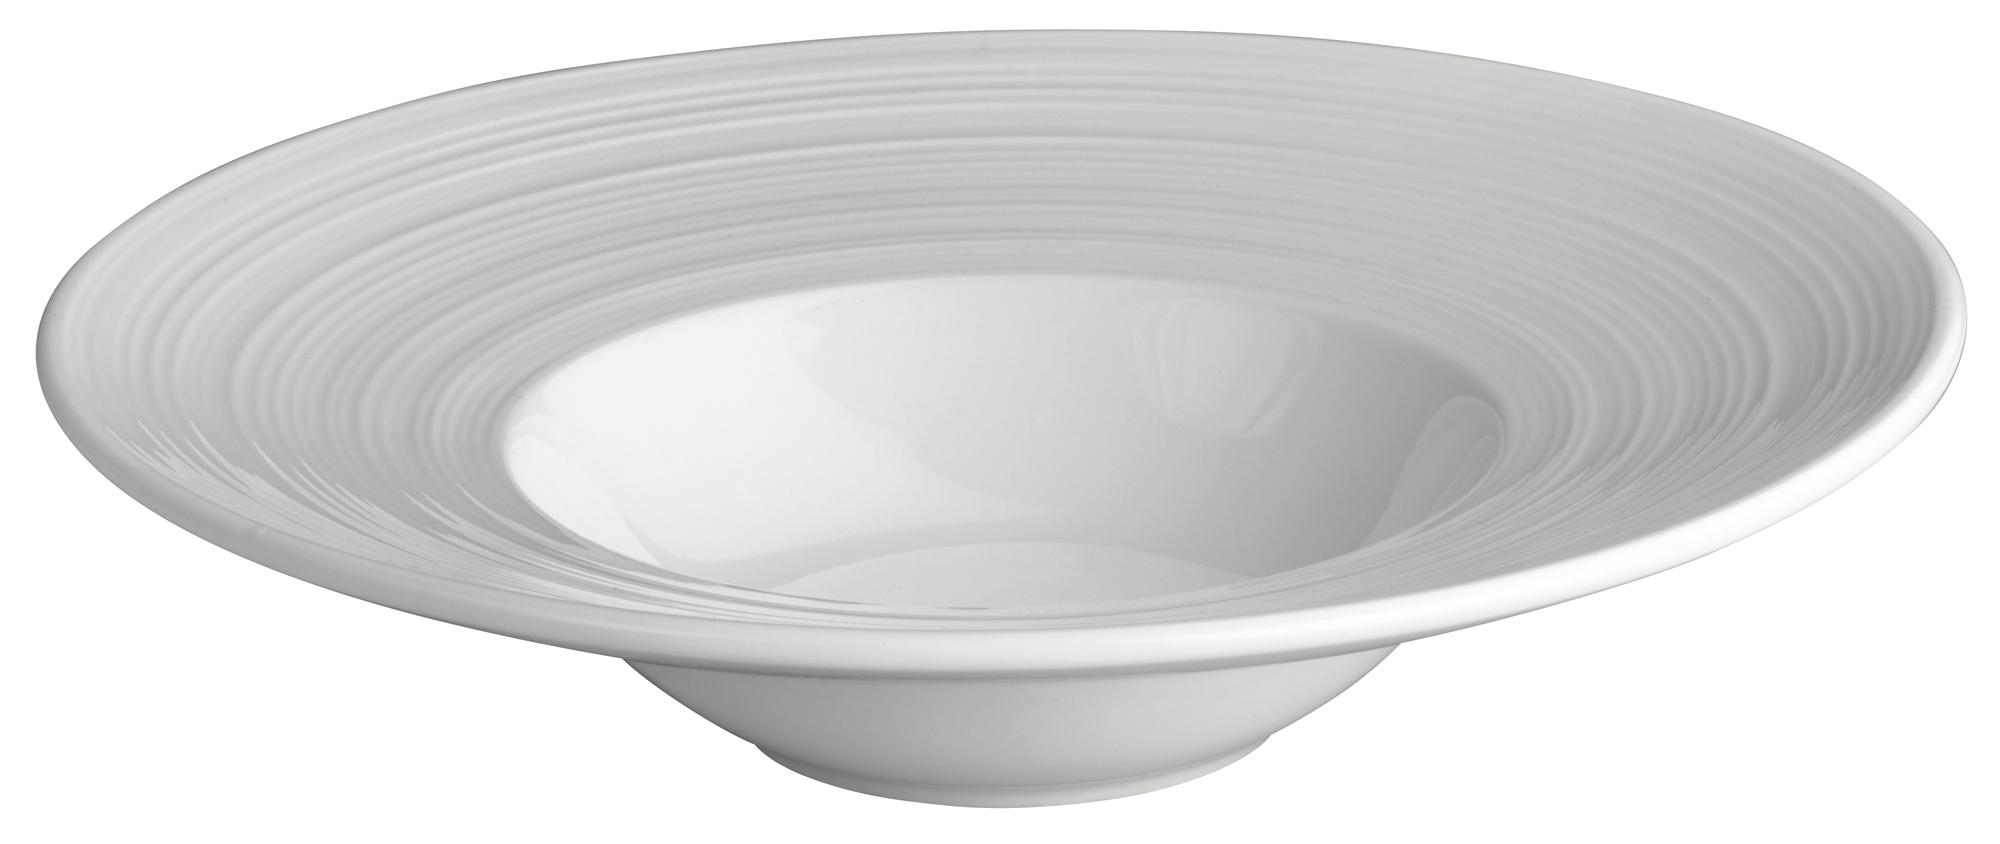 Winco WDP022-101 china, bowl,  0 - 8 oz